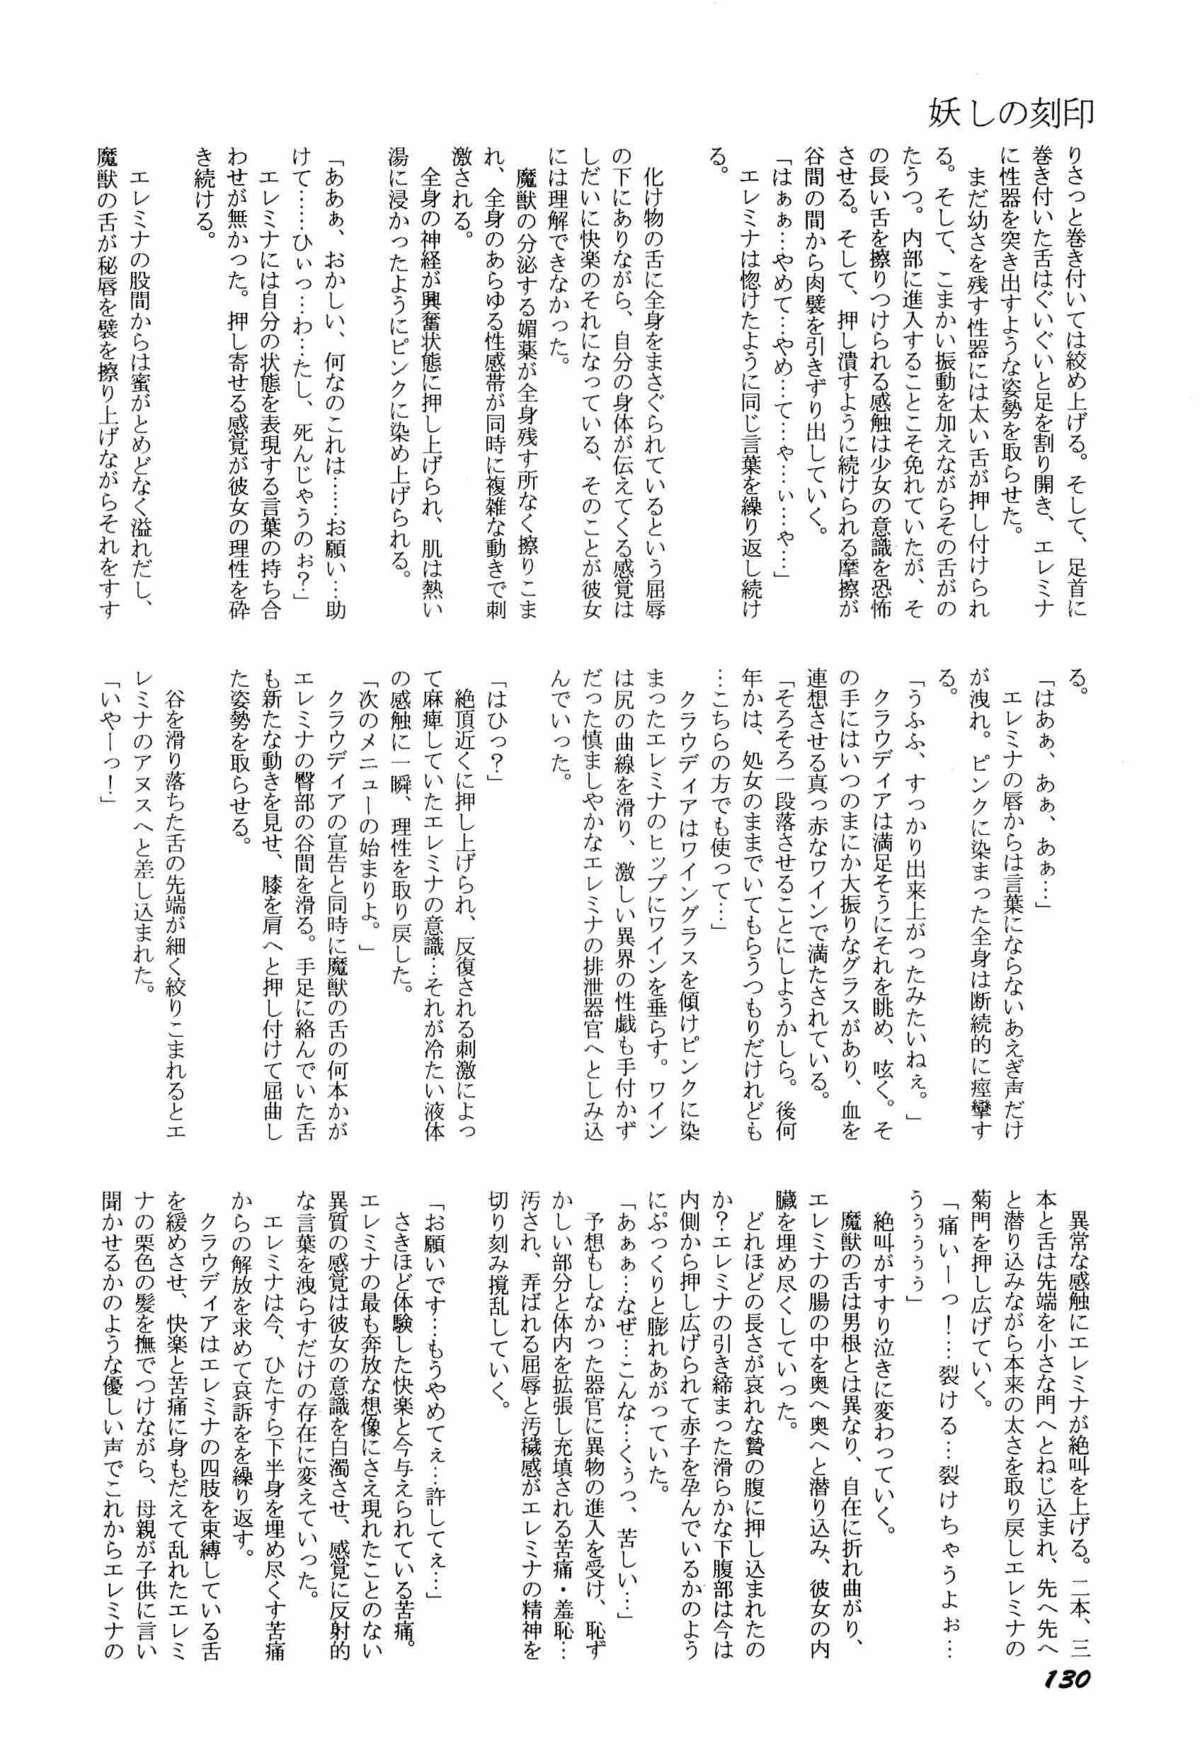 Bisyoujo Anthology '93 jyoukan 132